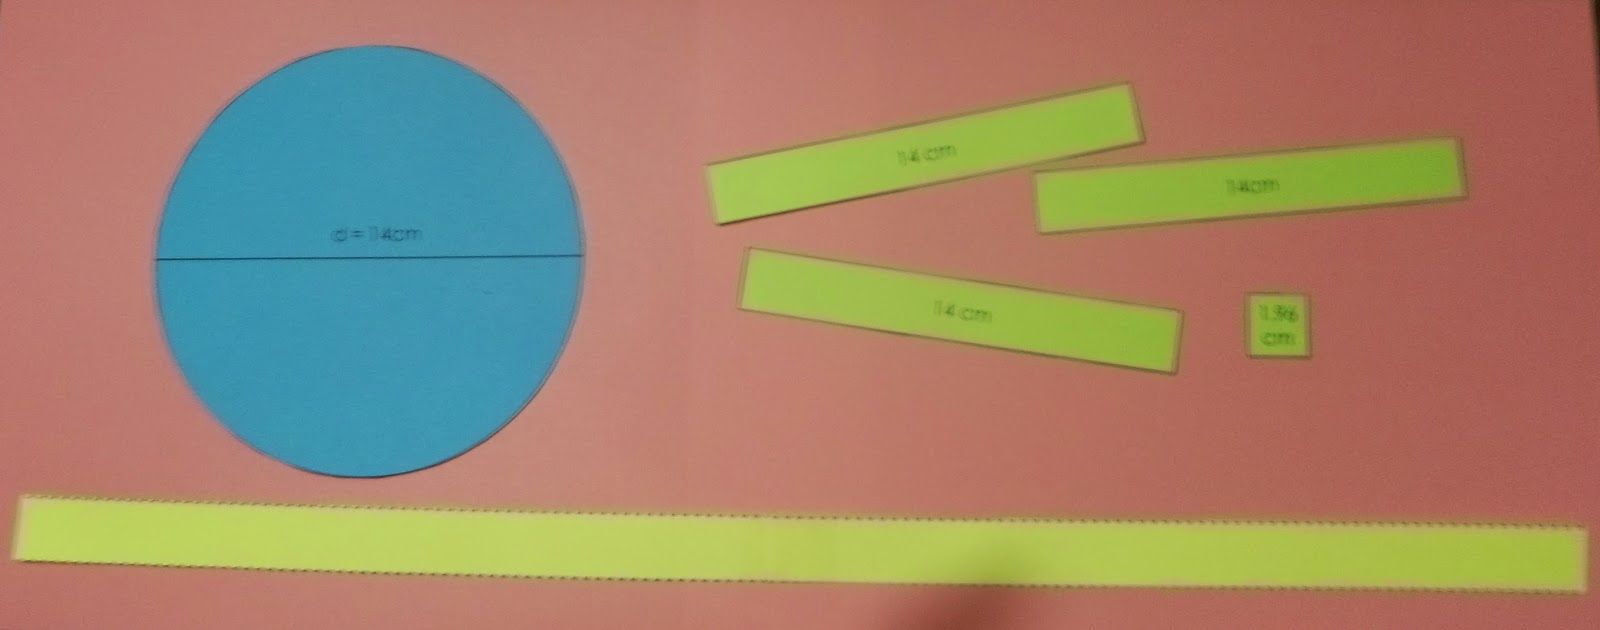 Nyla\'s Crafty Teaching: Free Pi Day Activity - Proving Circumference ...